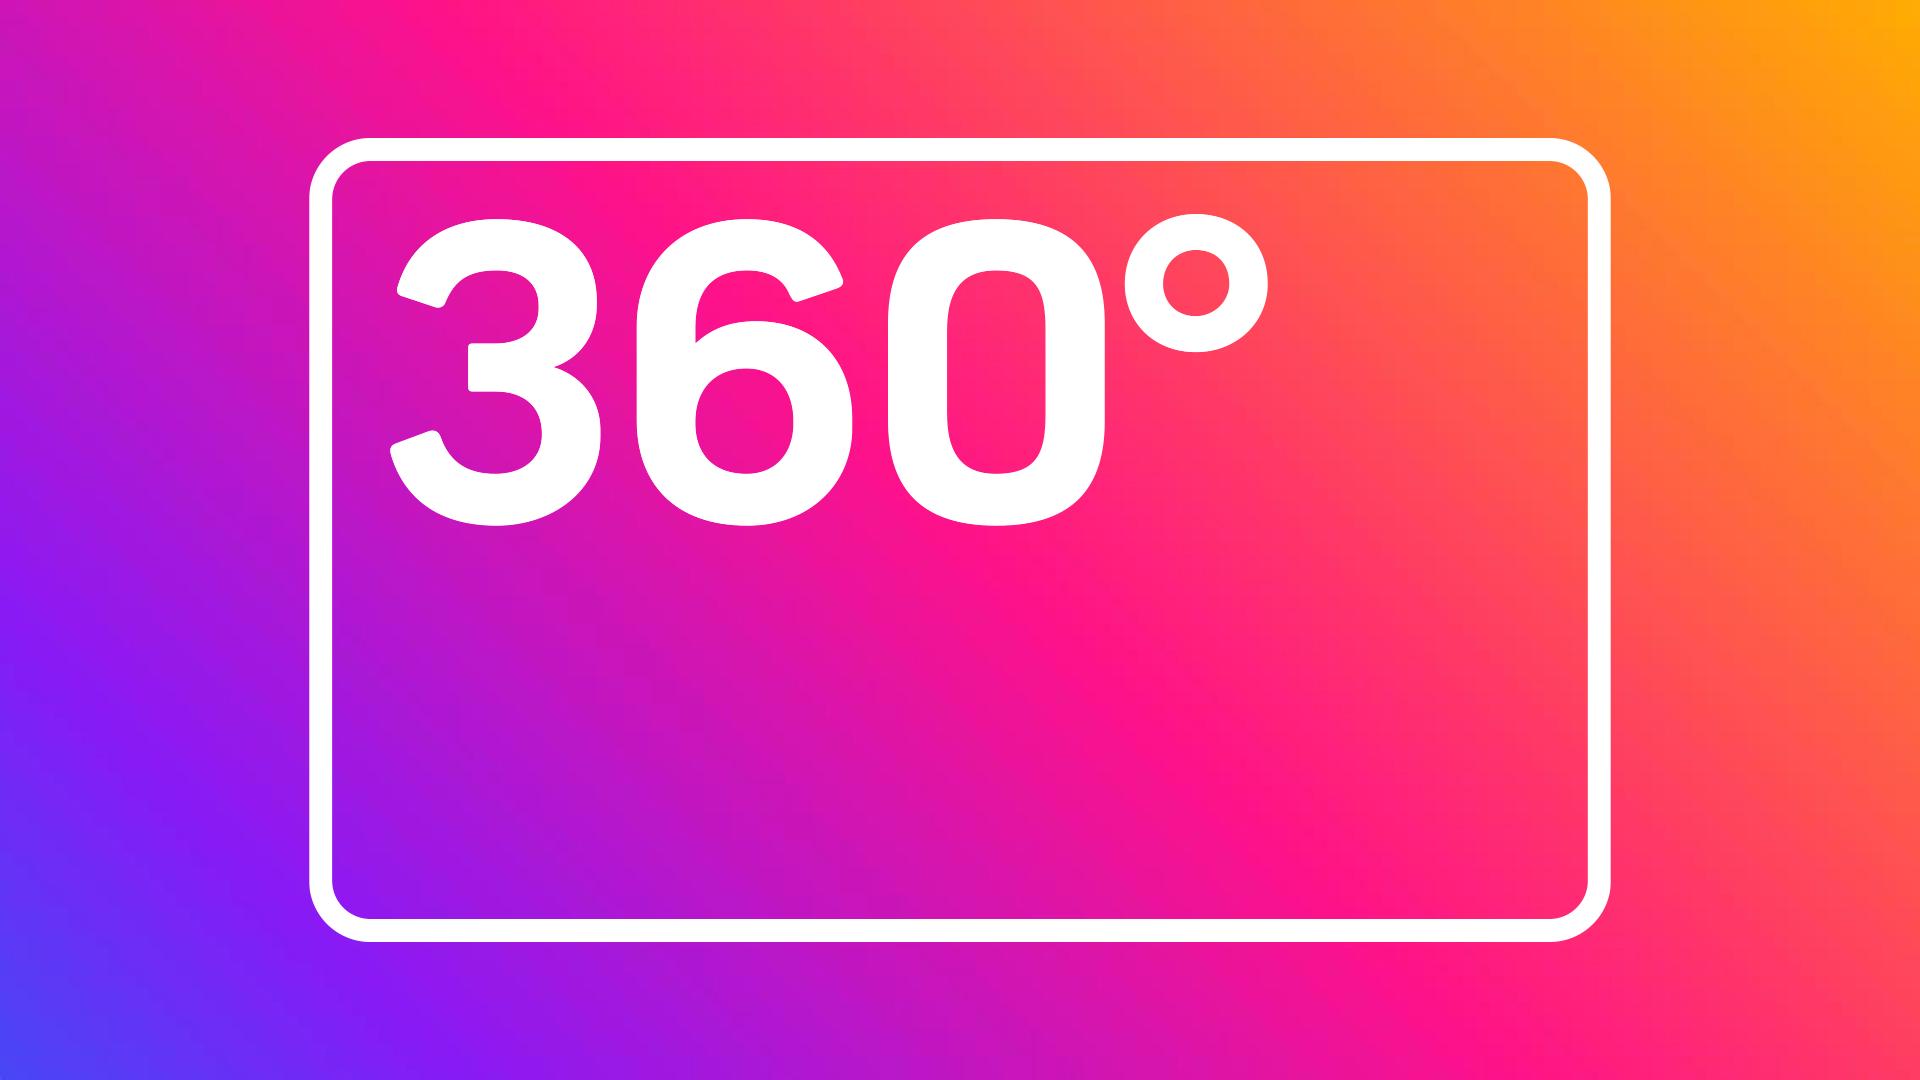 360° HD